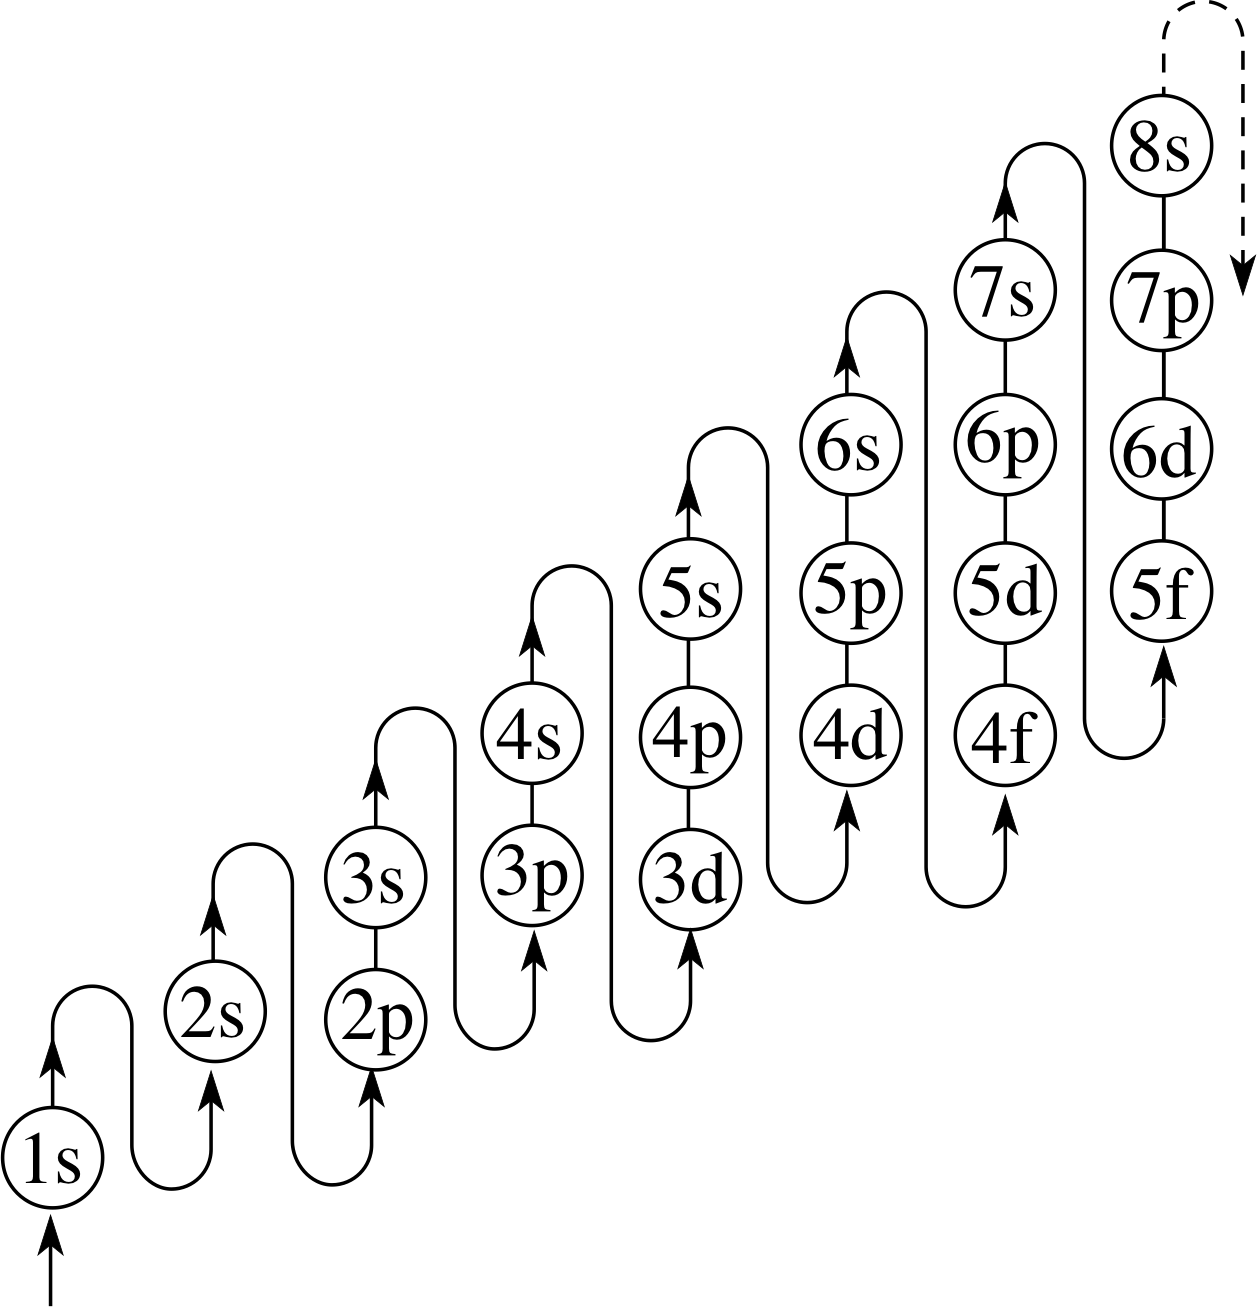 Pplato flap phys 83 multielectron atoms figure pooptronica